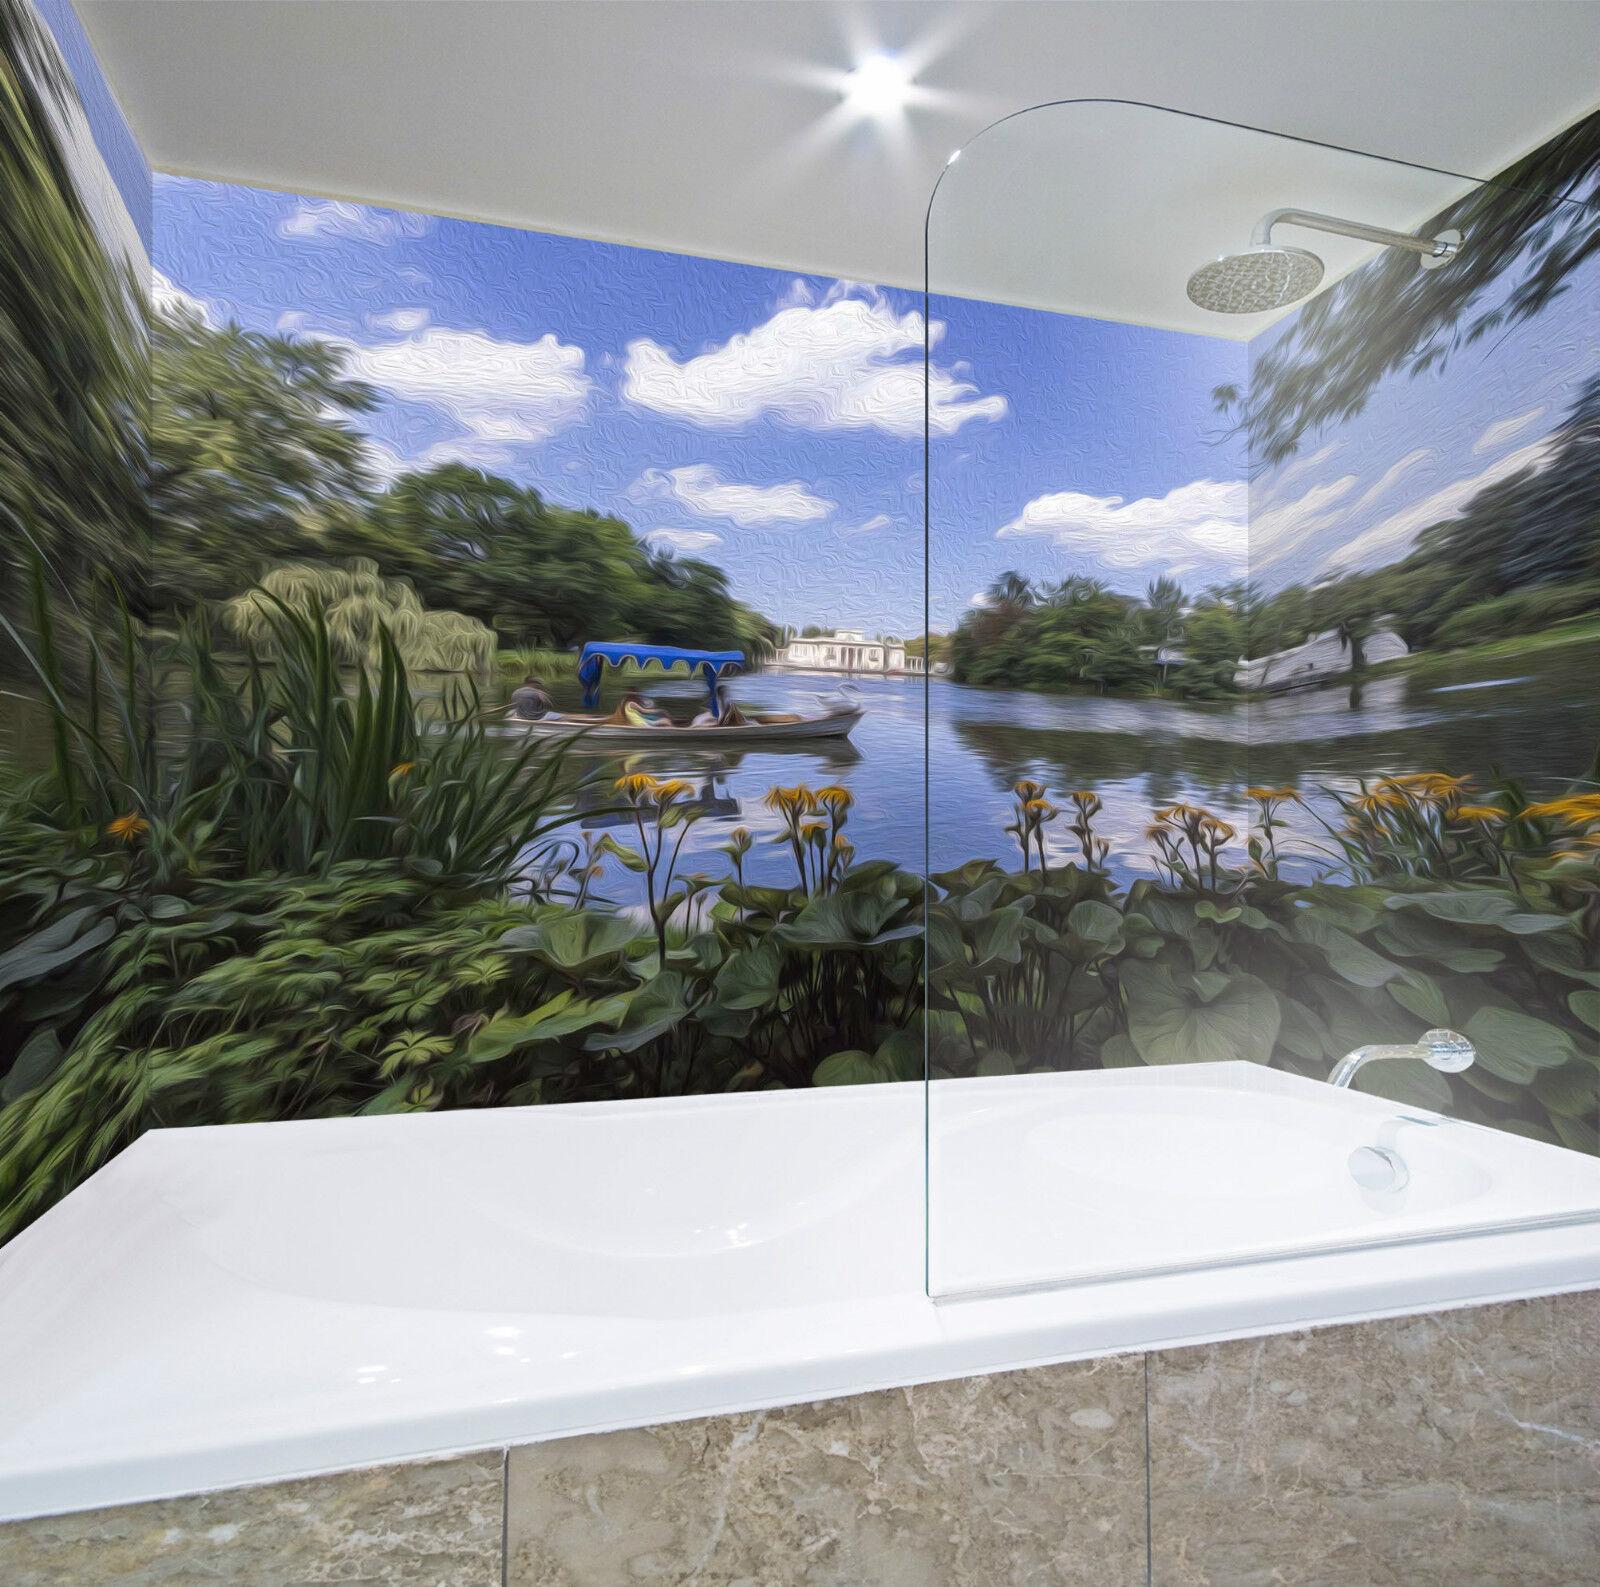 3D Lake Painting 062 WallPaper Bathroom Print Decal Wall Deco AJ WALLPAPER CA